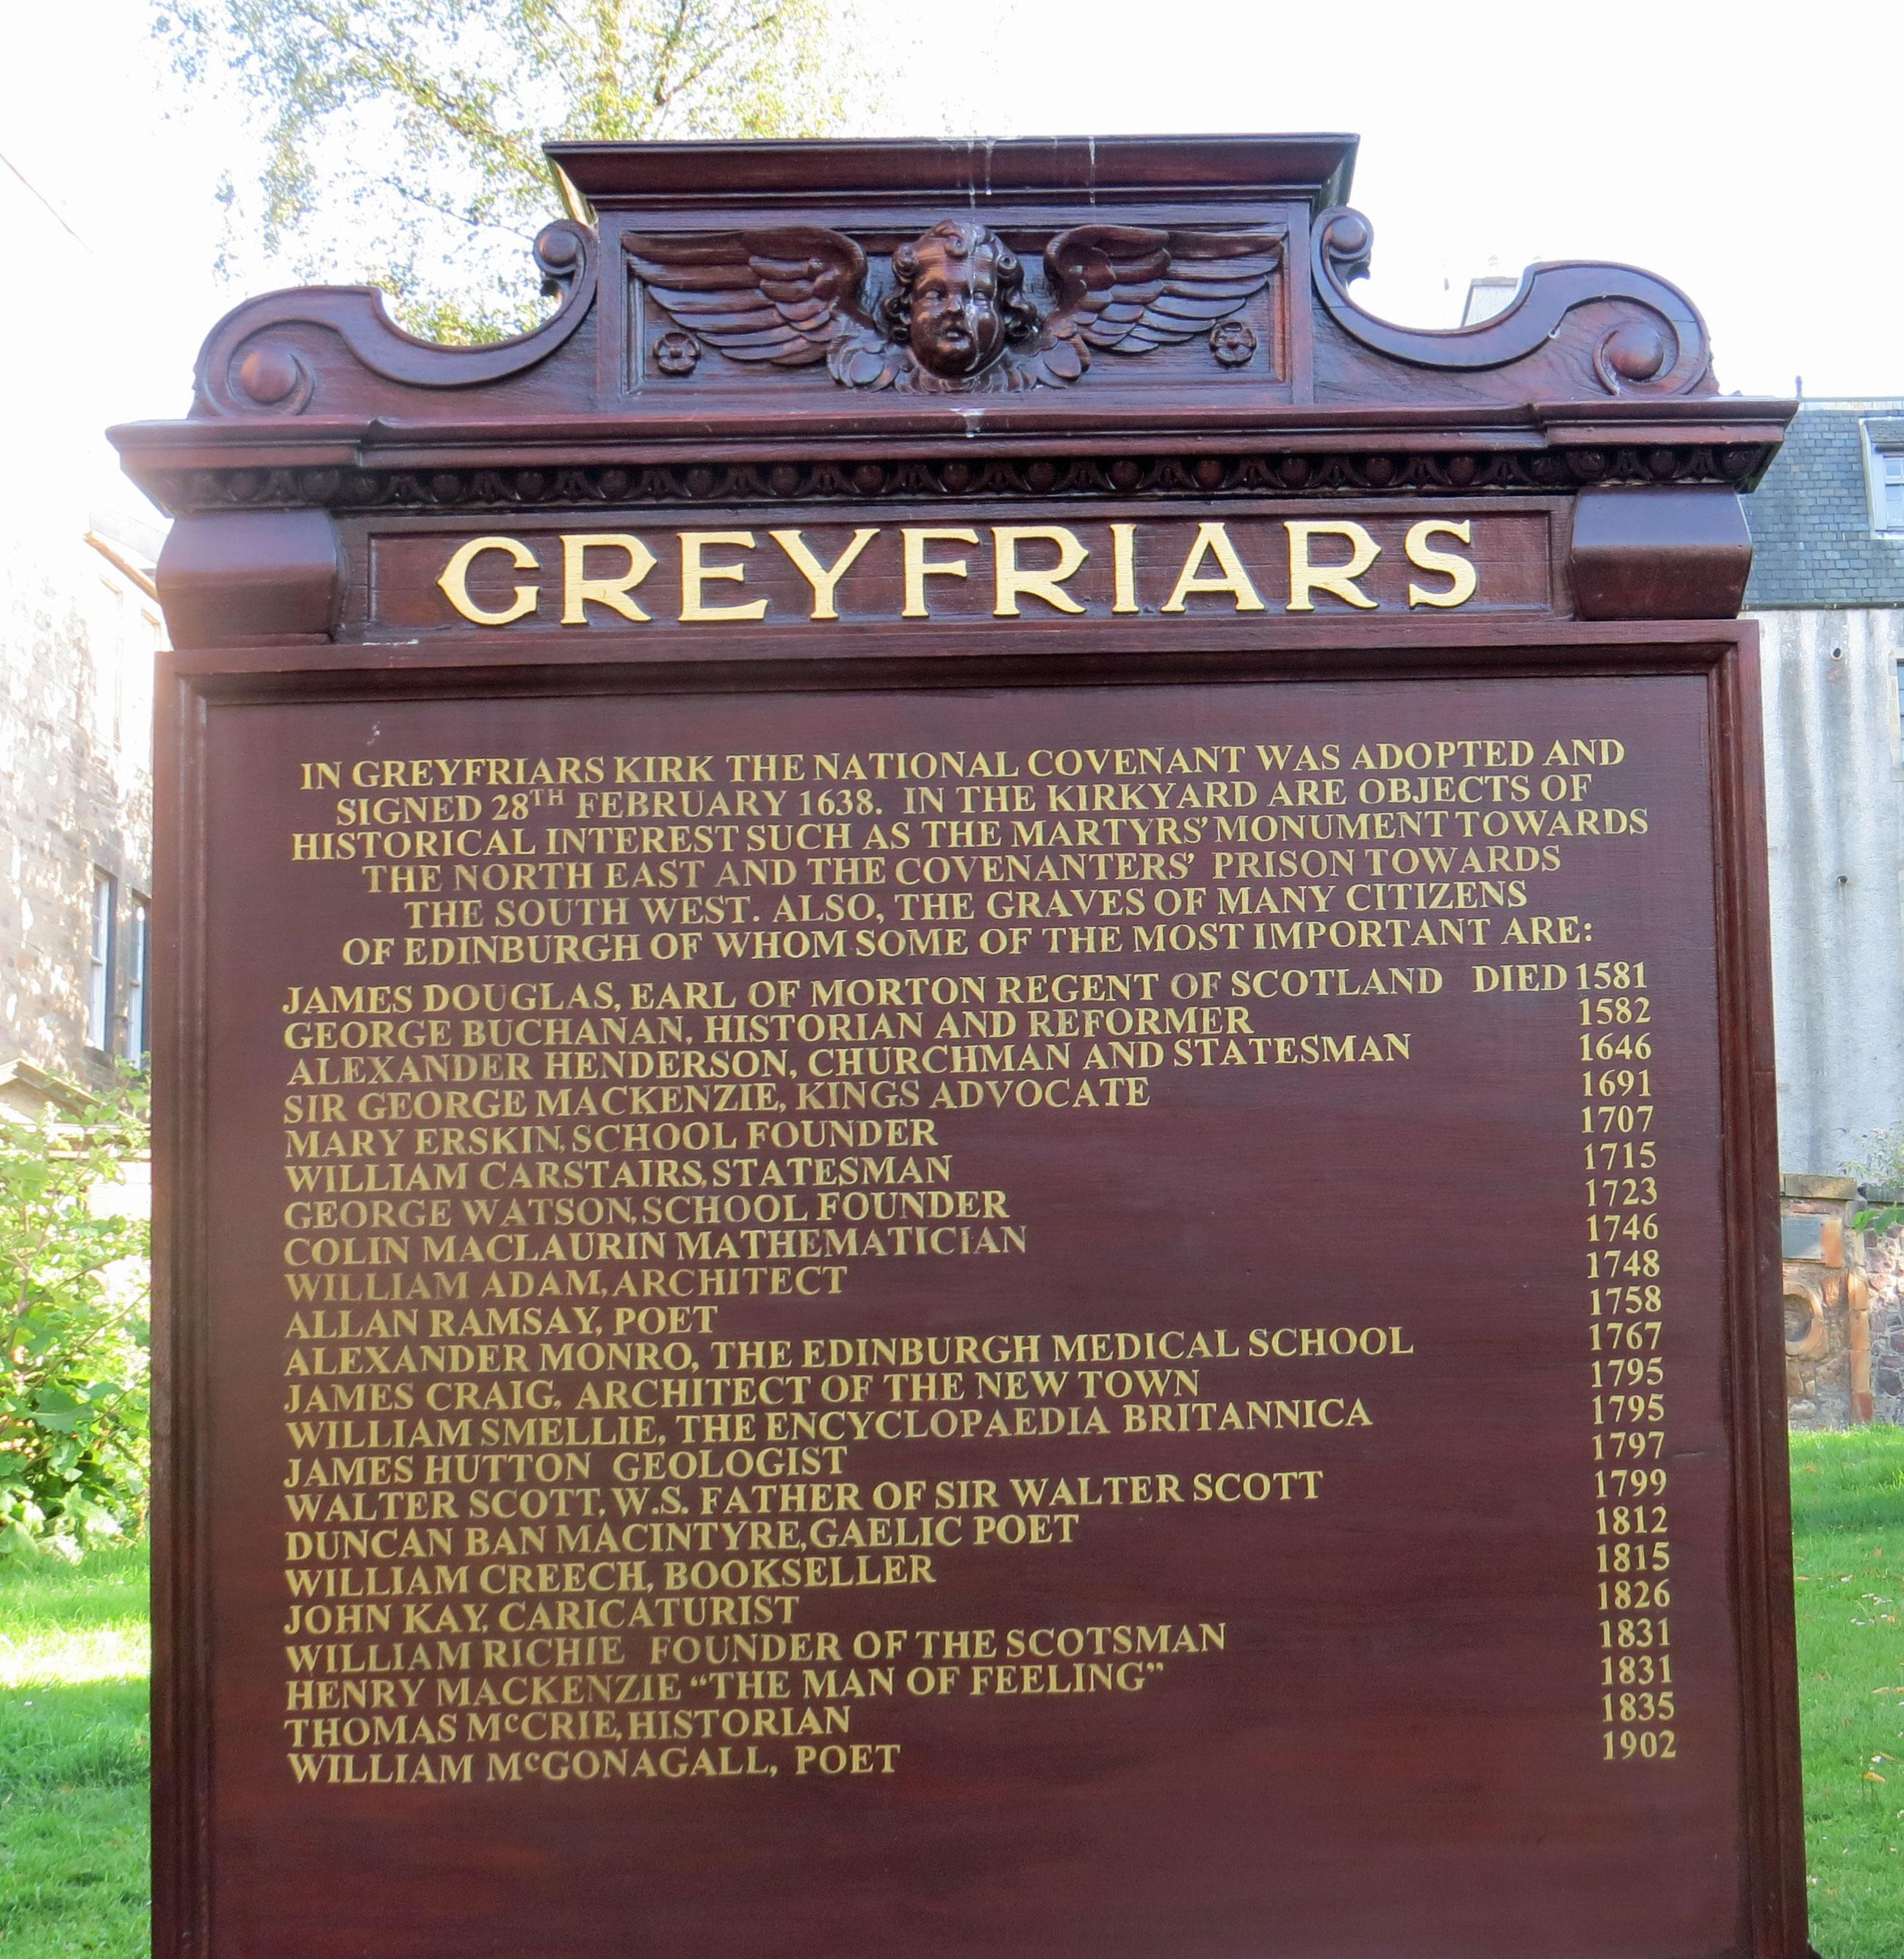 UK-Edinburgh-Greyfriar's-Kirk-sign-7-23-19